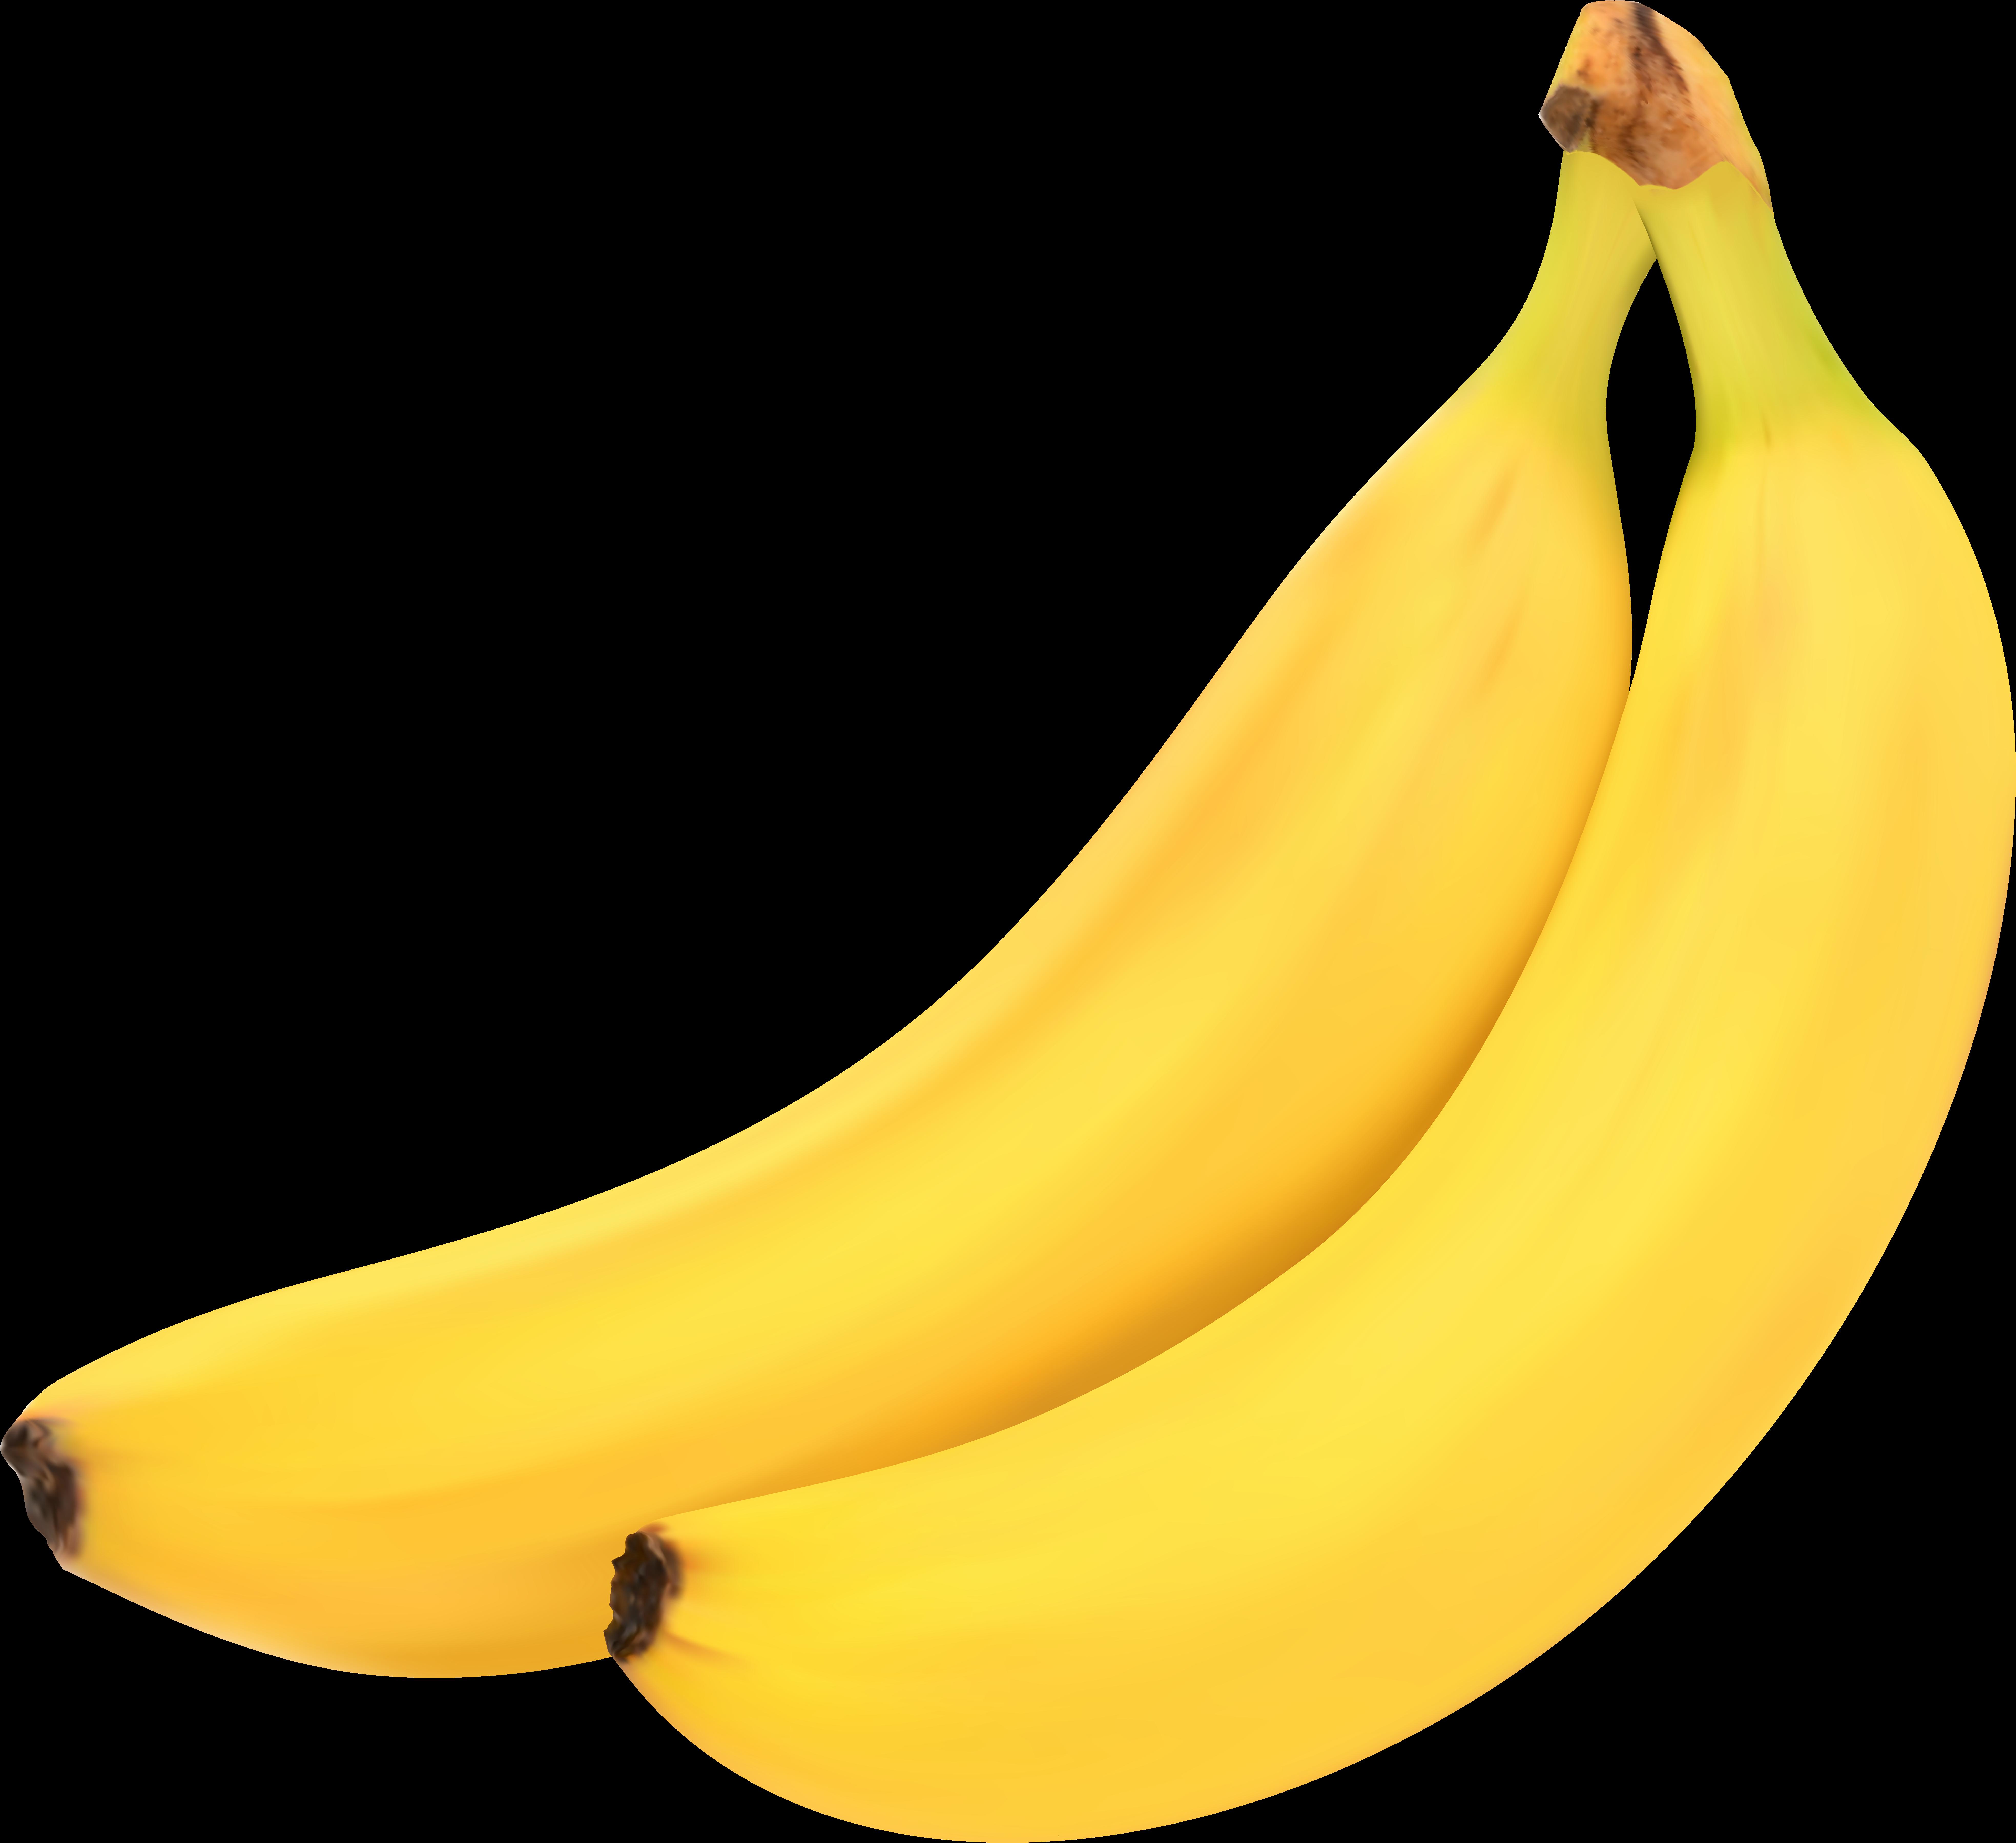 Clip art library . Clipart banana high quality